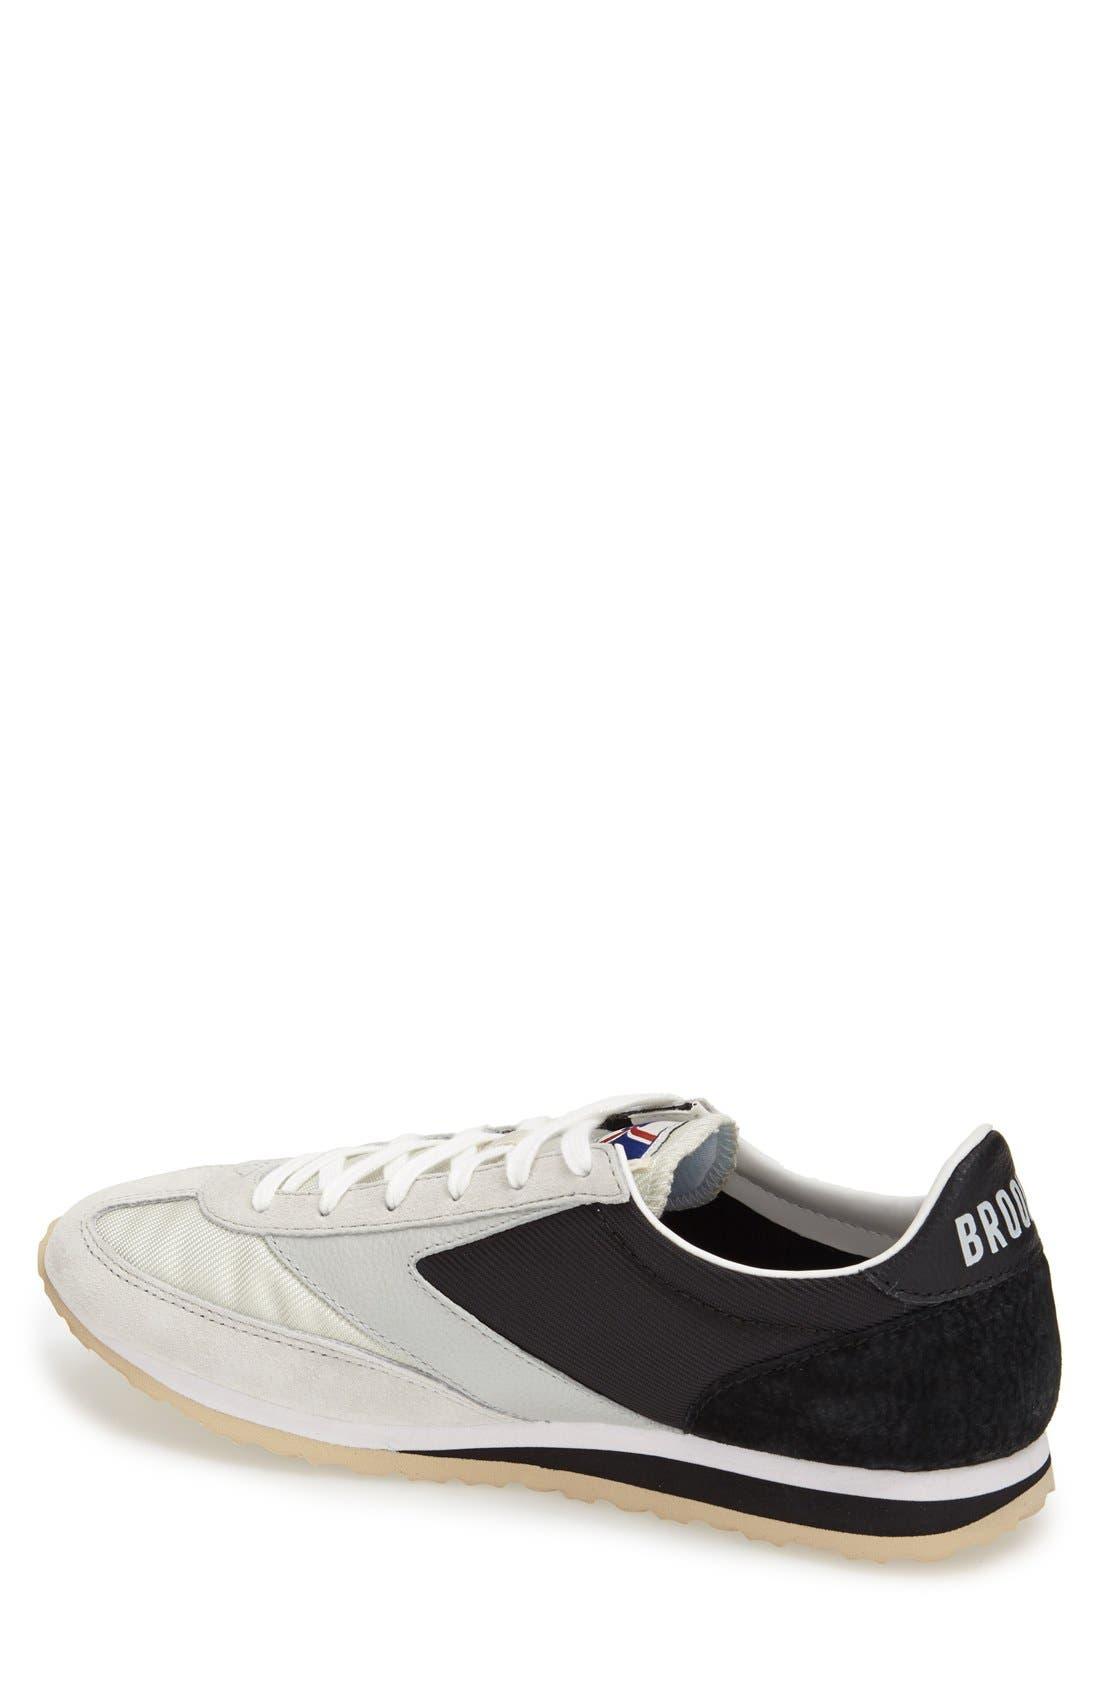 'Vanguard' Sneaker,                             Alternate thumbnail 4, color,                             001